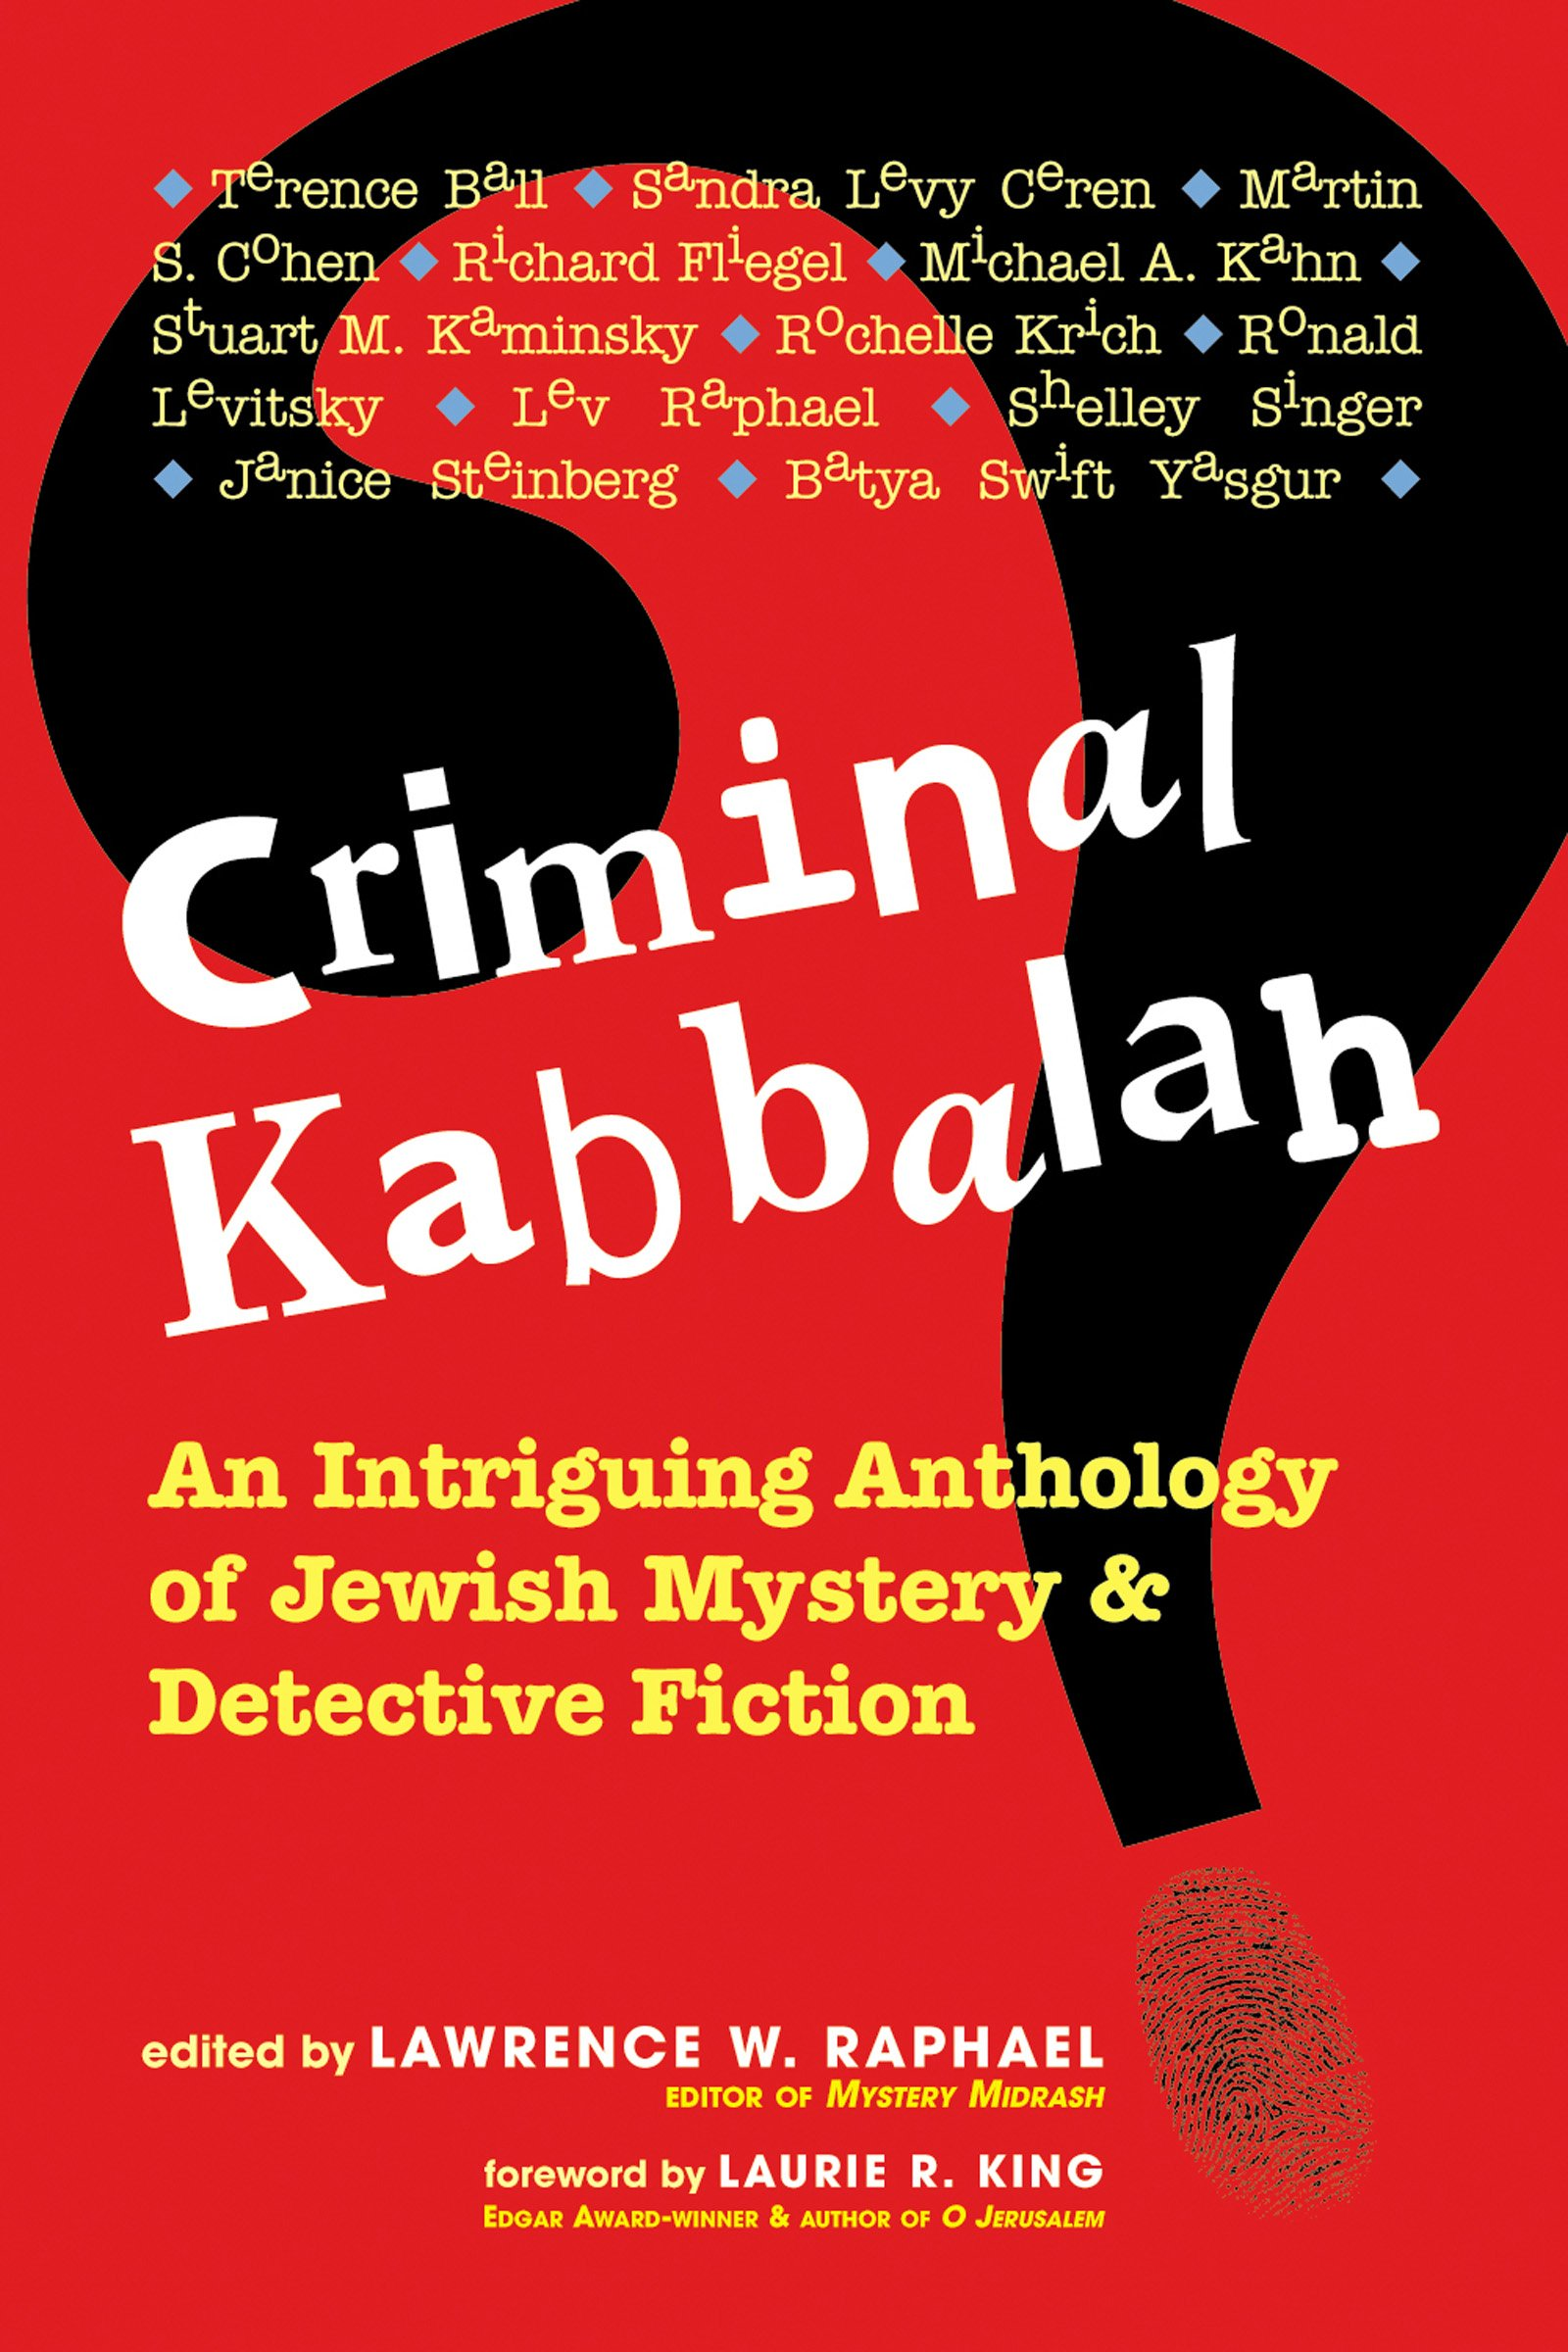 Criminal Kabbalah: An Intriguing Anthology of Jewish Mystery and Detective Fiction: 0